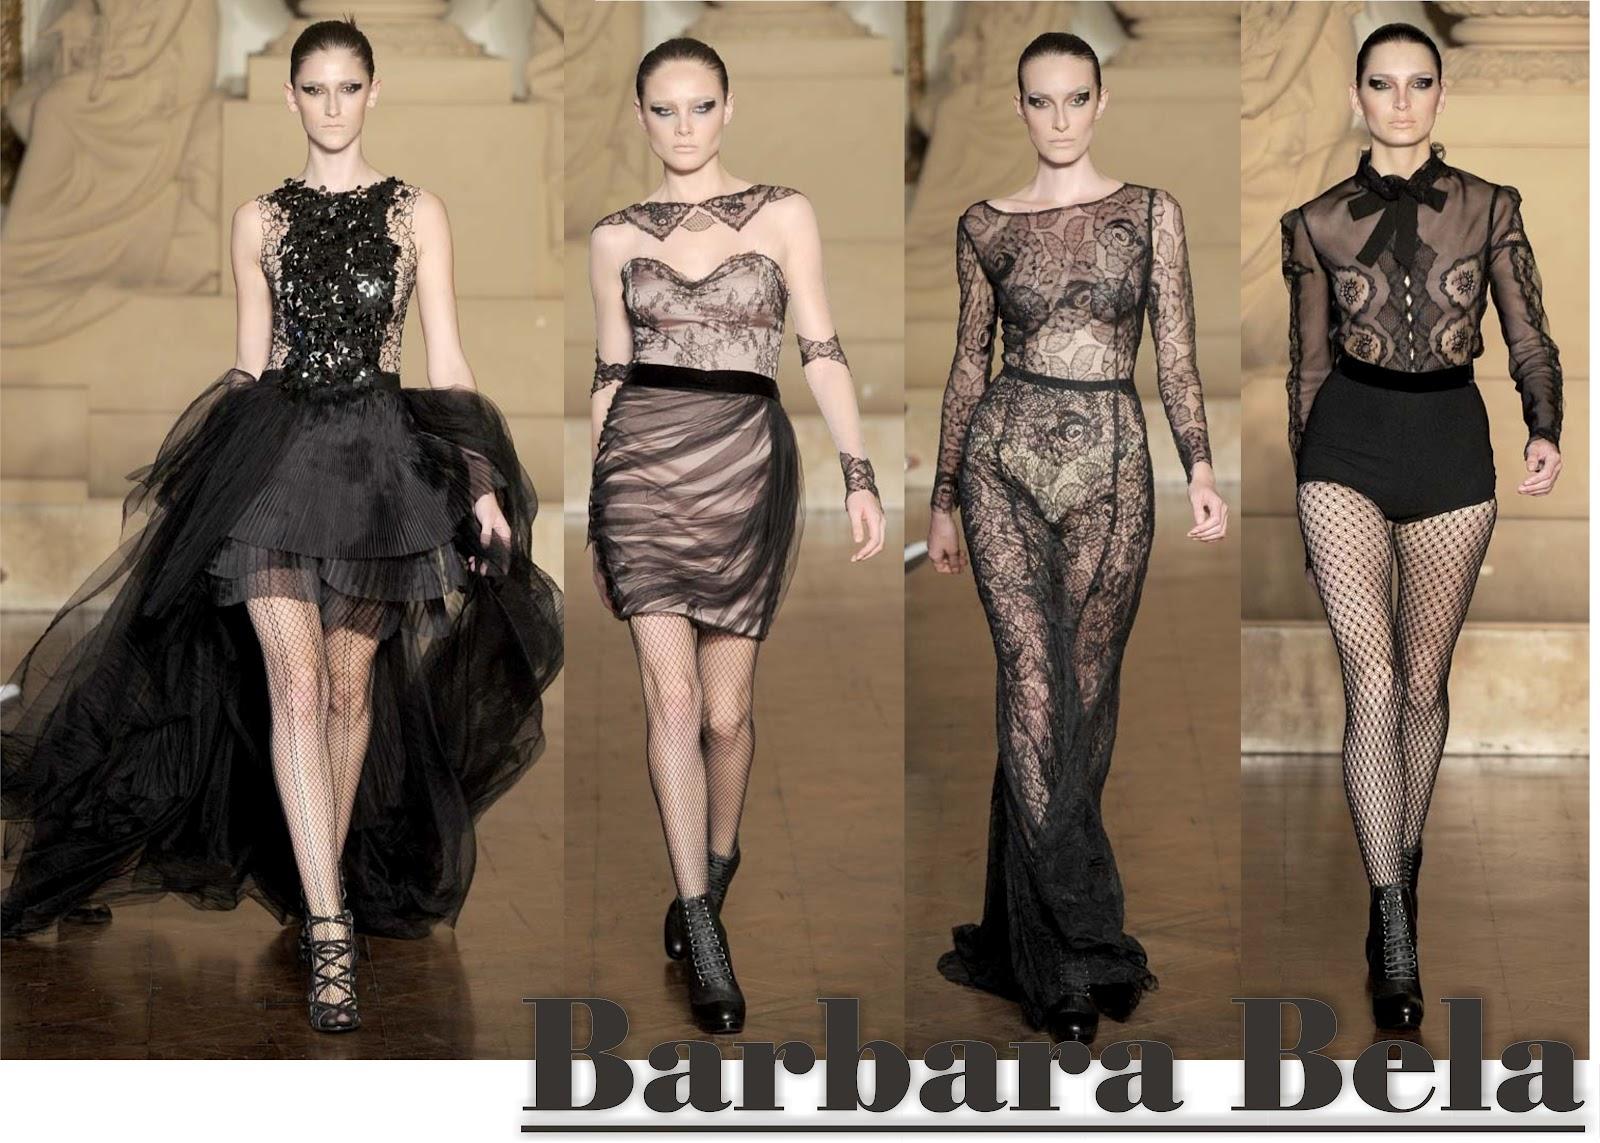 http://4.bp.blogspot.com/-iMO1HlYTJA8/T_91Zc2YVAI/AAAAAAAAC5c/ihn44Xn4RnQ/s1600/Fashion+Rio+Inverno+2011+-+Barbara+Bela.jpg